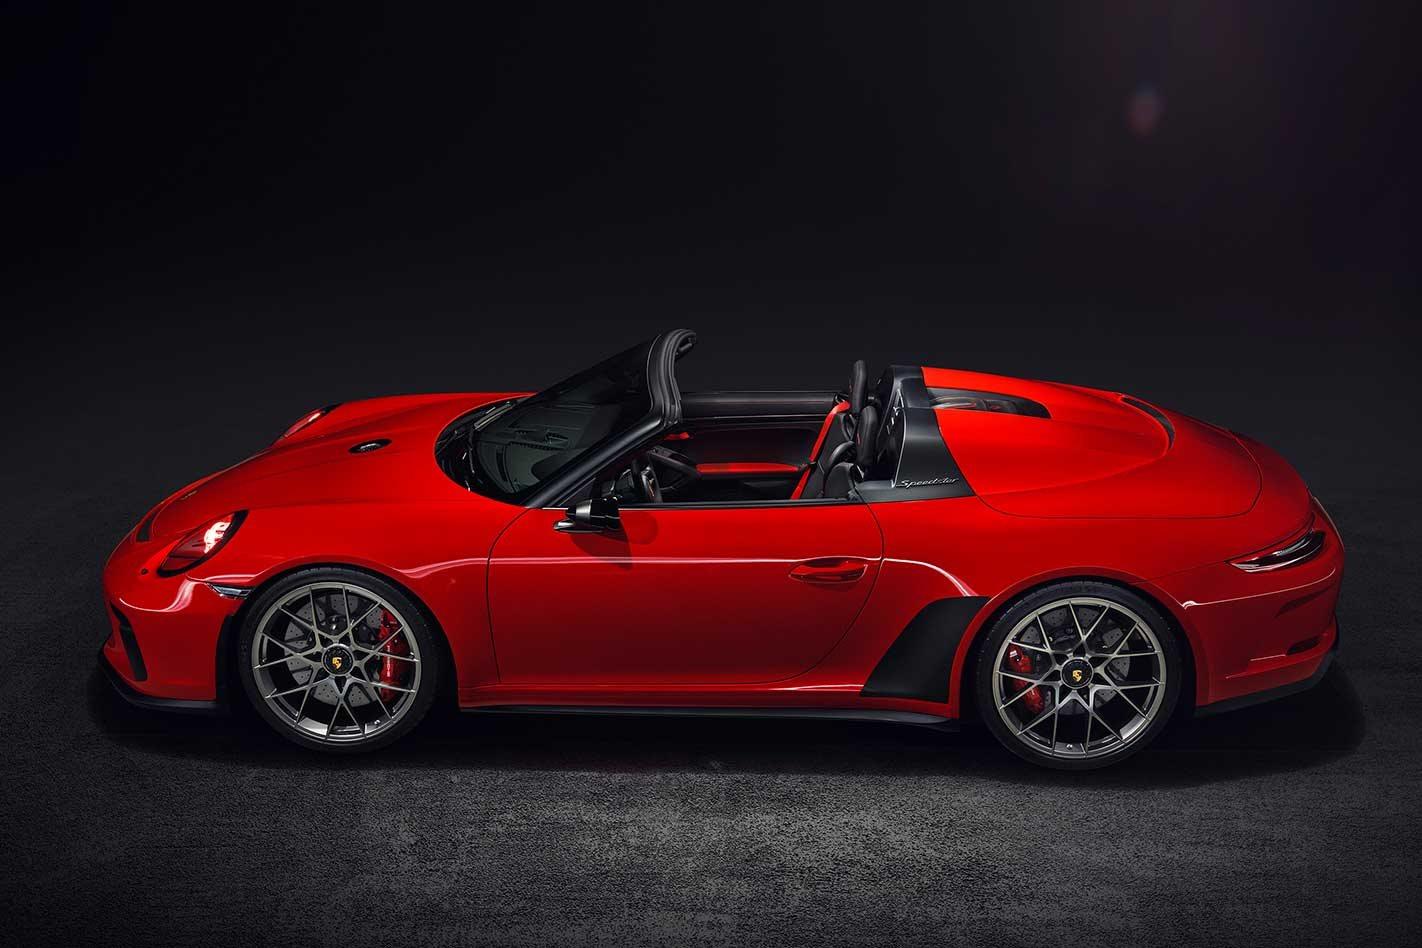 2019 Porsche 911 Speedster Confirmed For Production 2018